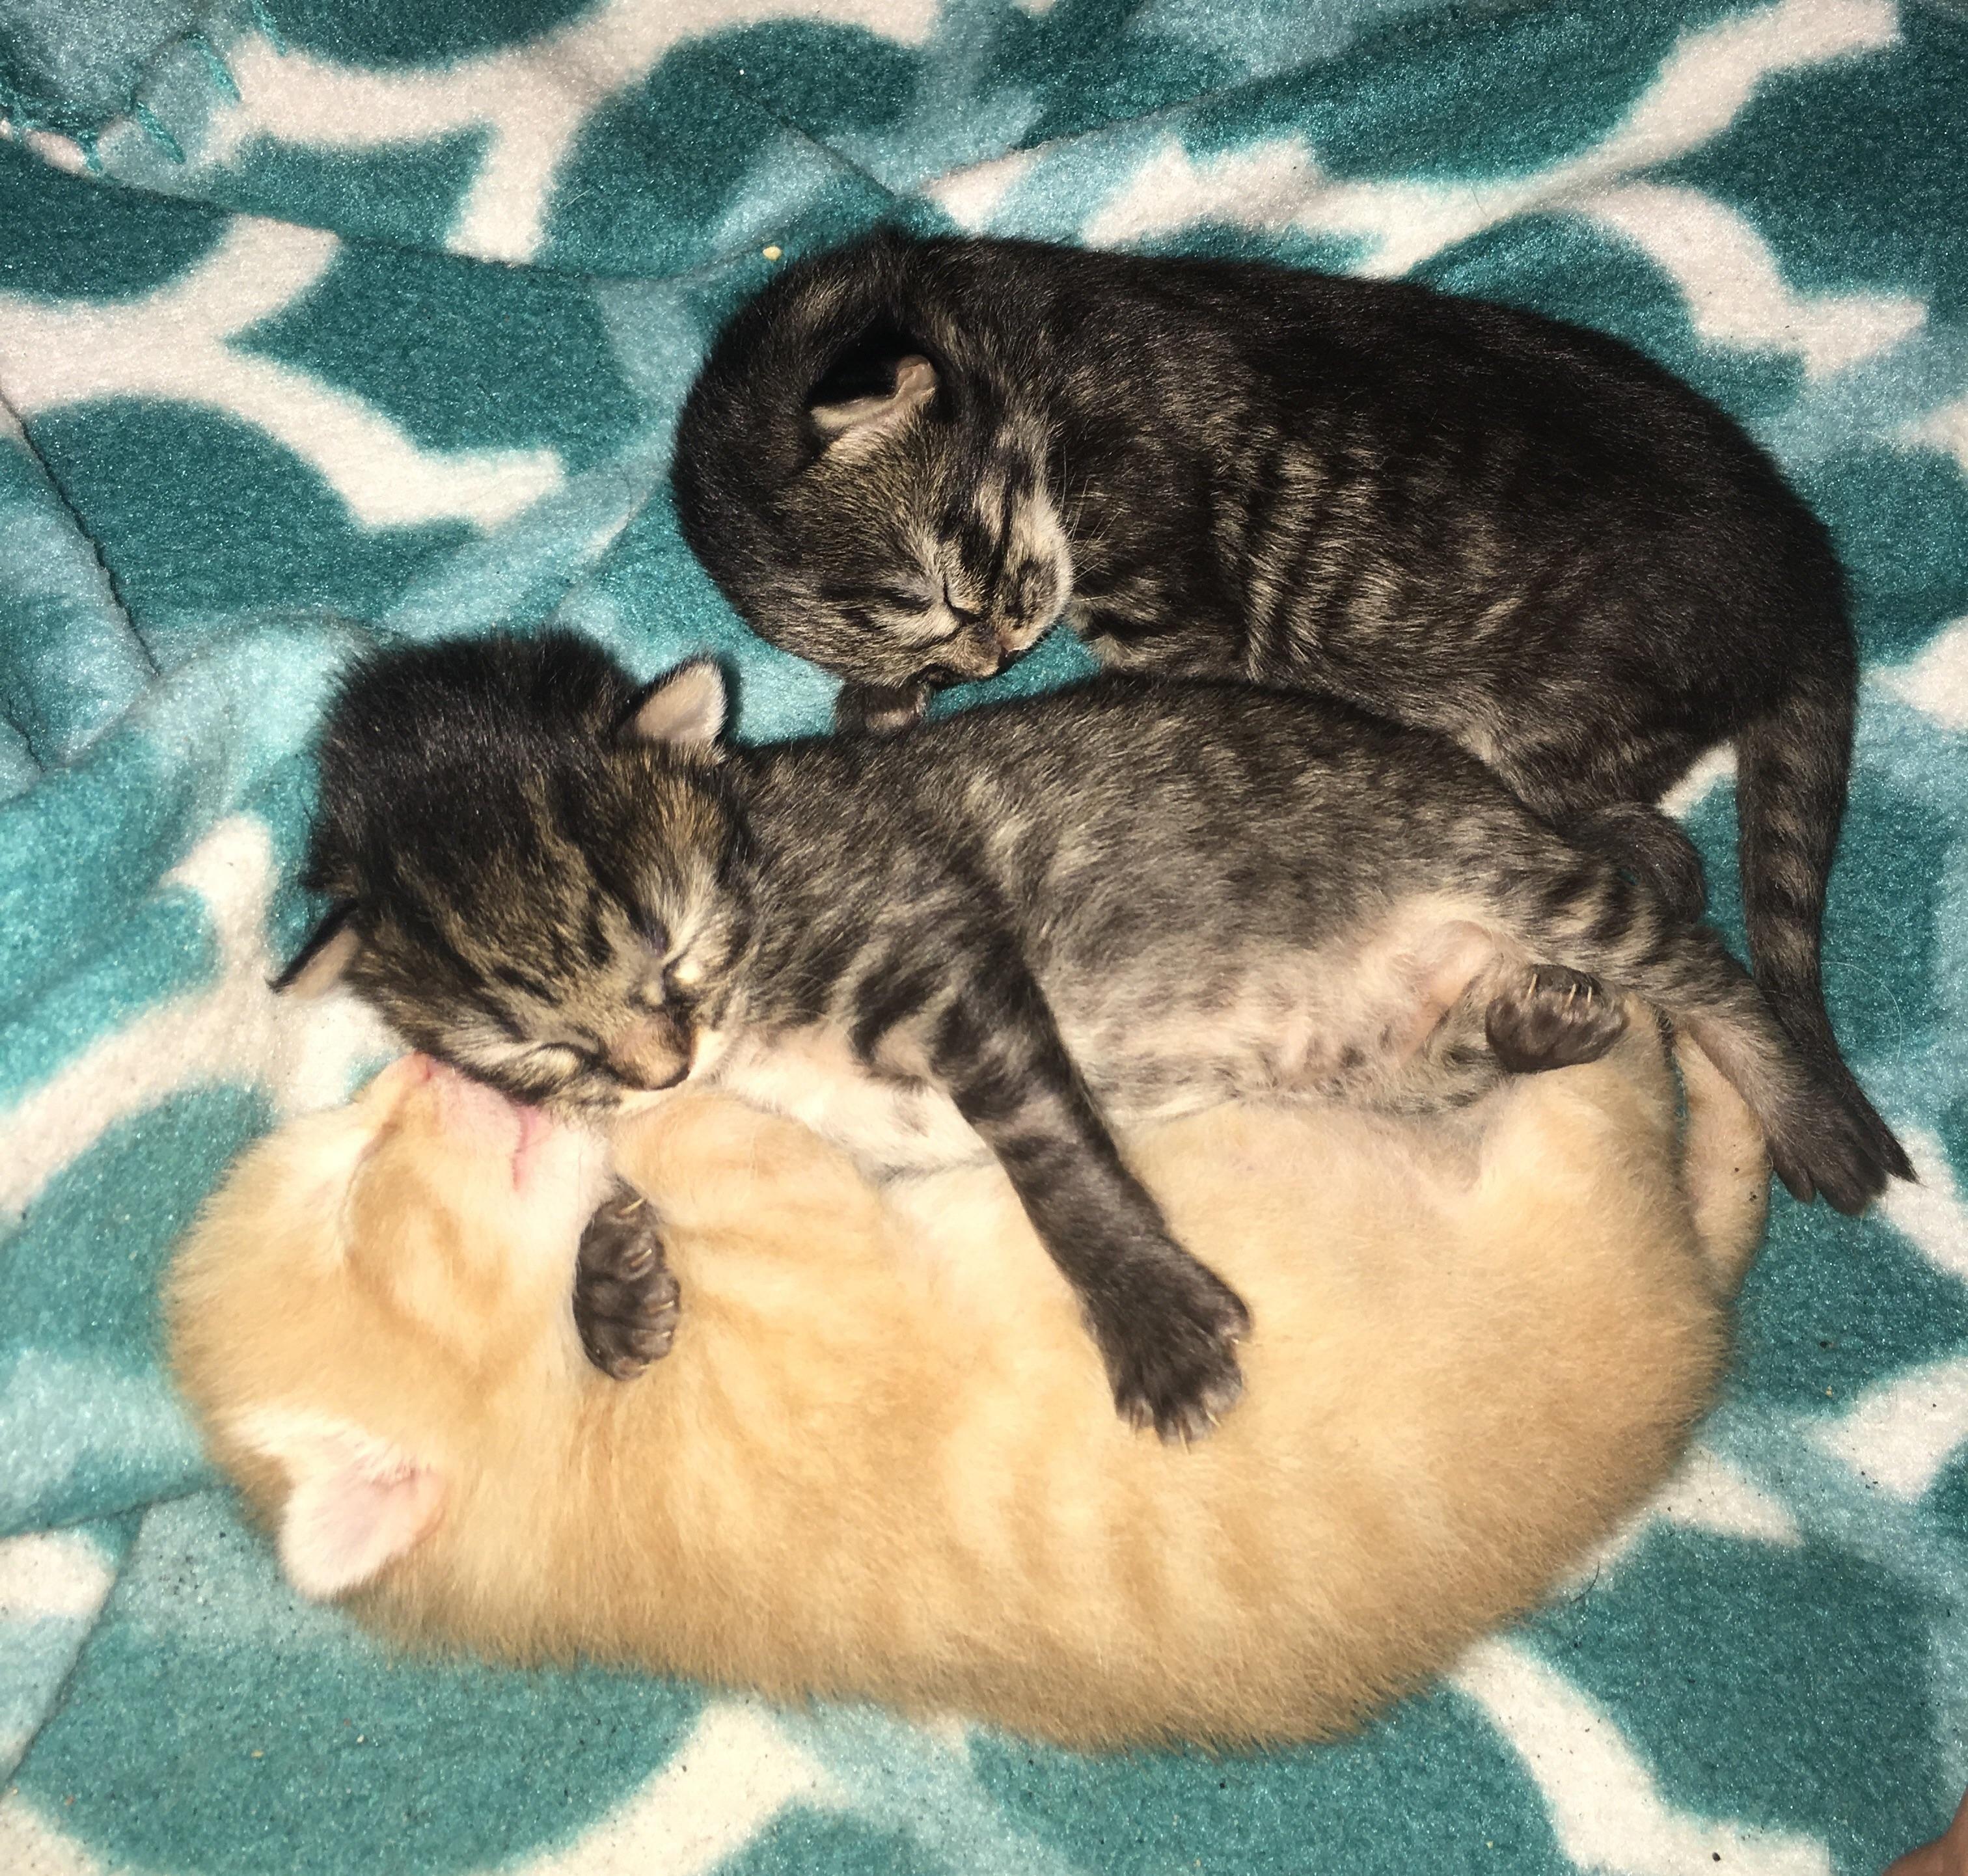 A Kitten Caboodle Https Ift Tt 2onrxts Kitten Kittens Cats